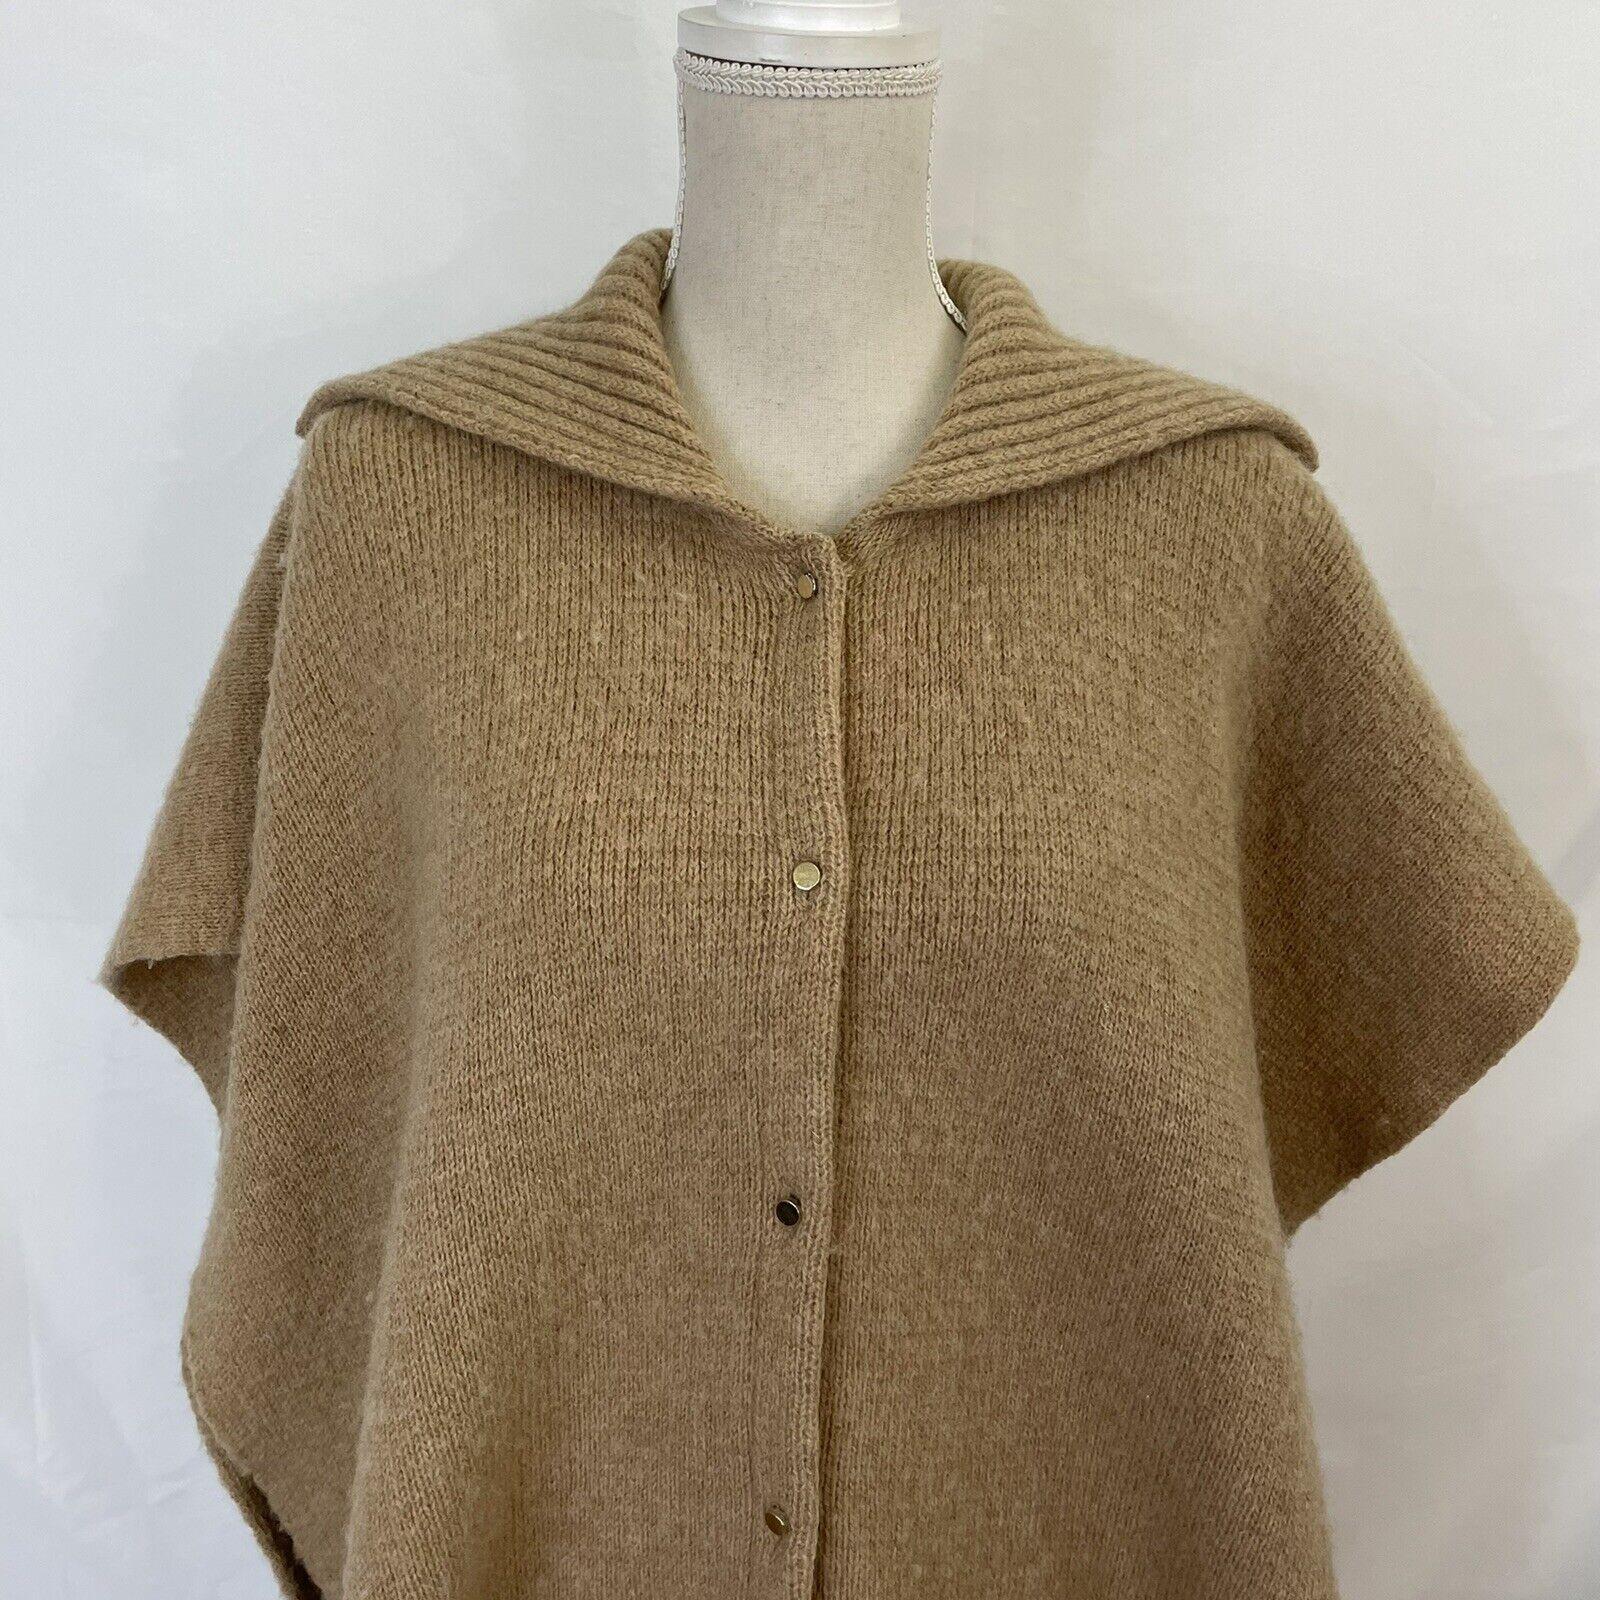 Bonnie Cashin Camel Knit Sweater Cape Poncho Coat - image 3